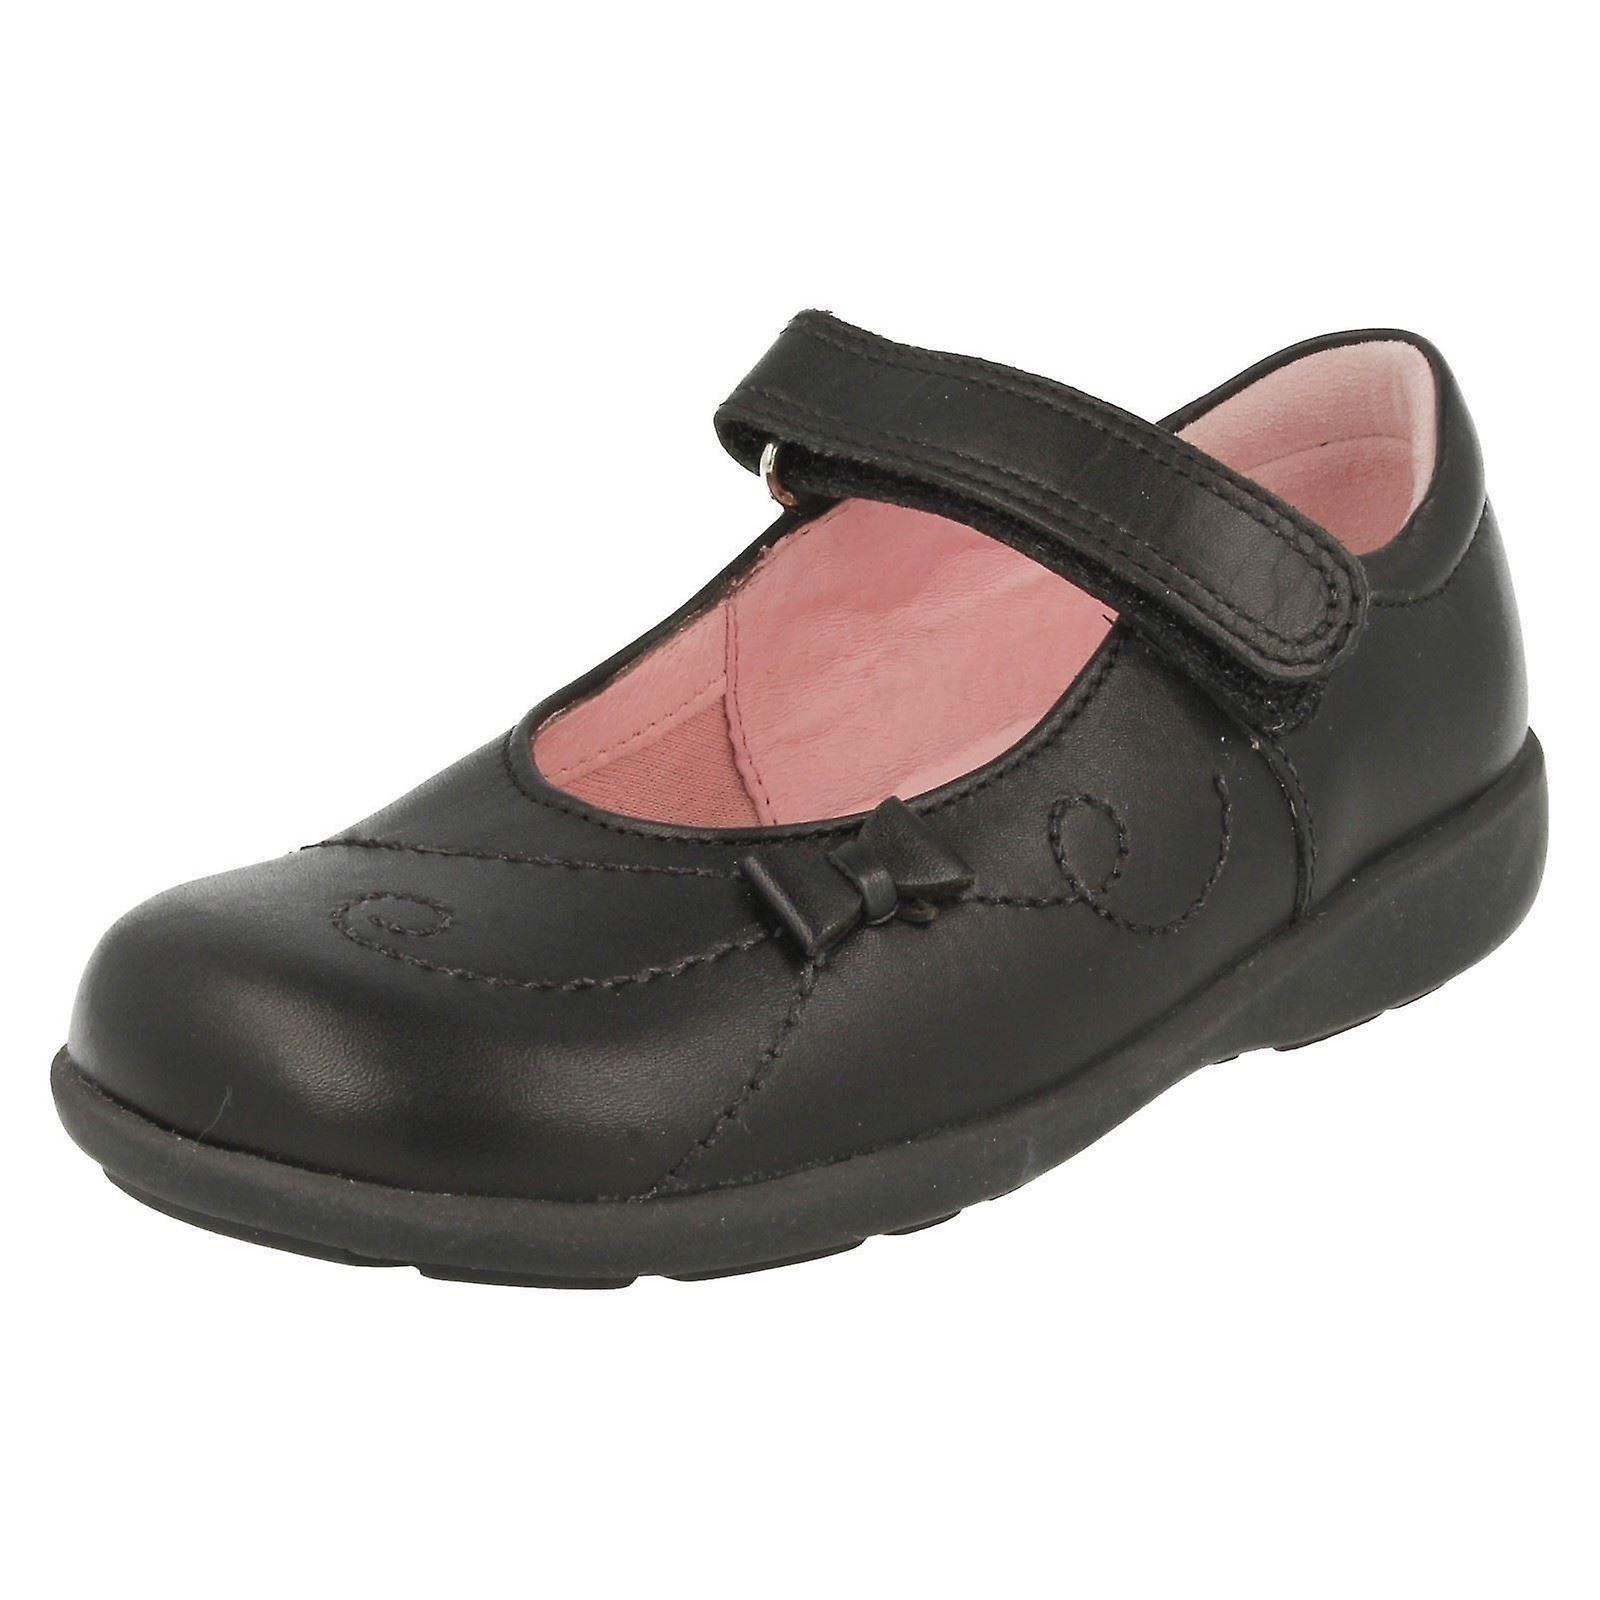 Girls Startrite Smart a School Shoes Paper/ Has a Smart long reputation /Man/Woman 602182